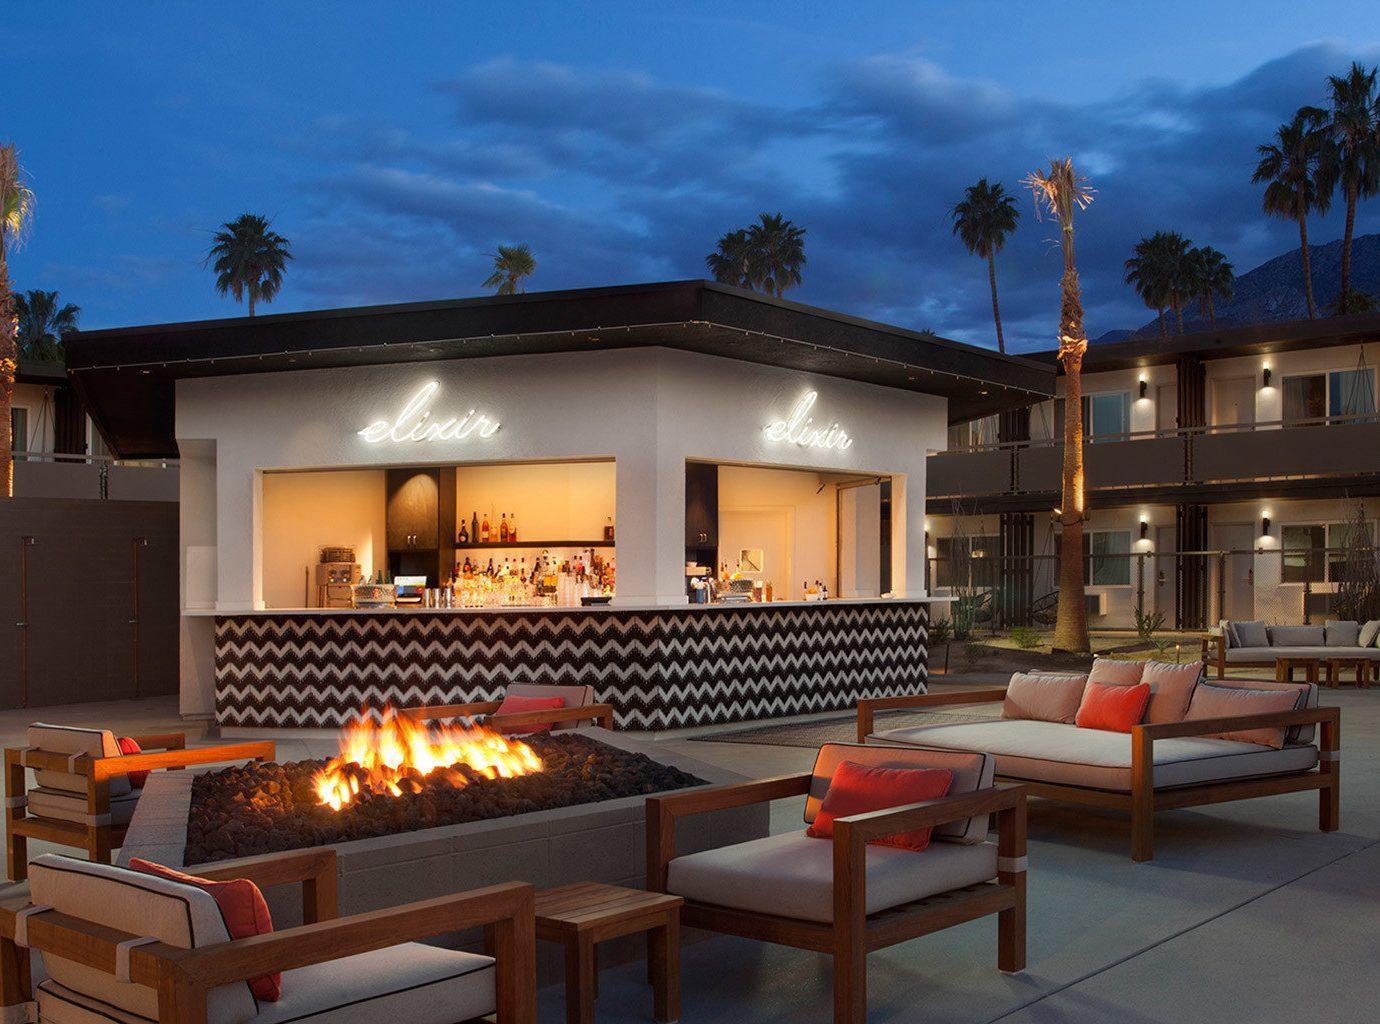 sky property building house Villa home hacienda Resort mansion